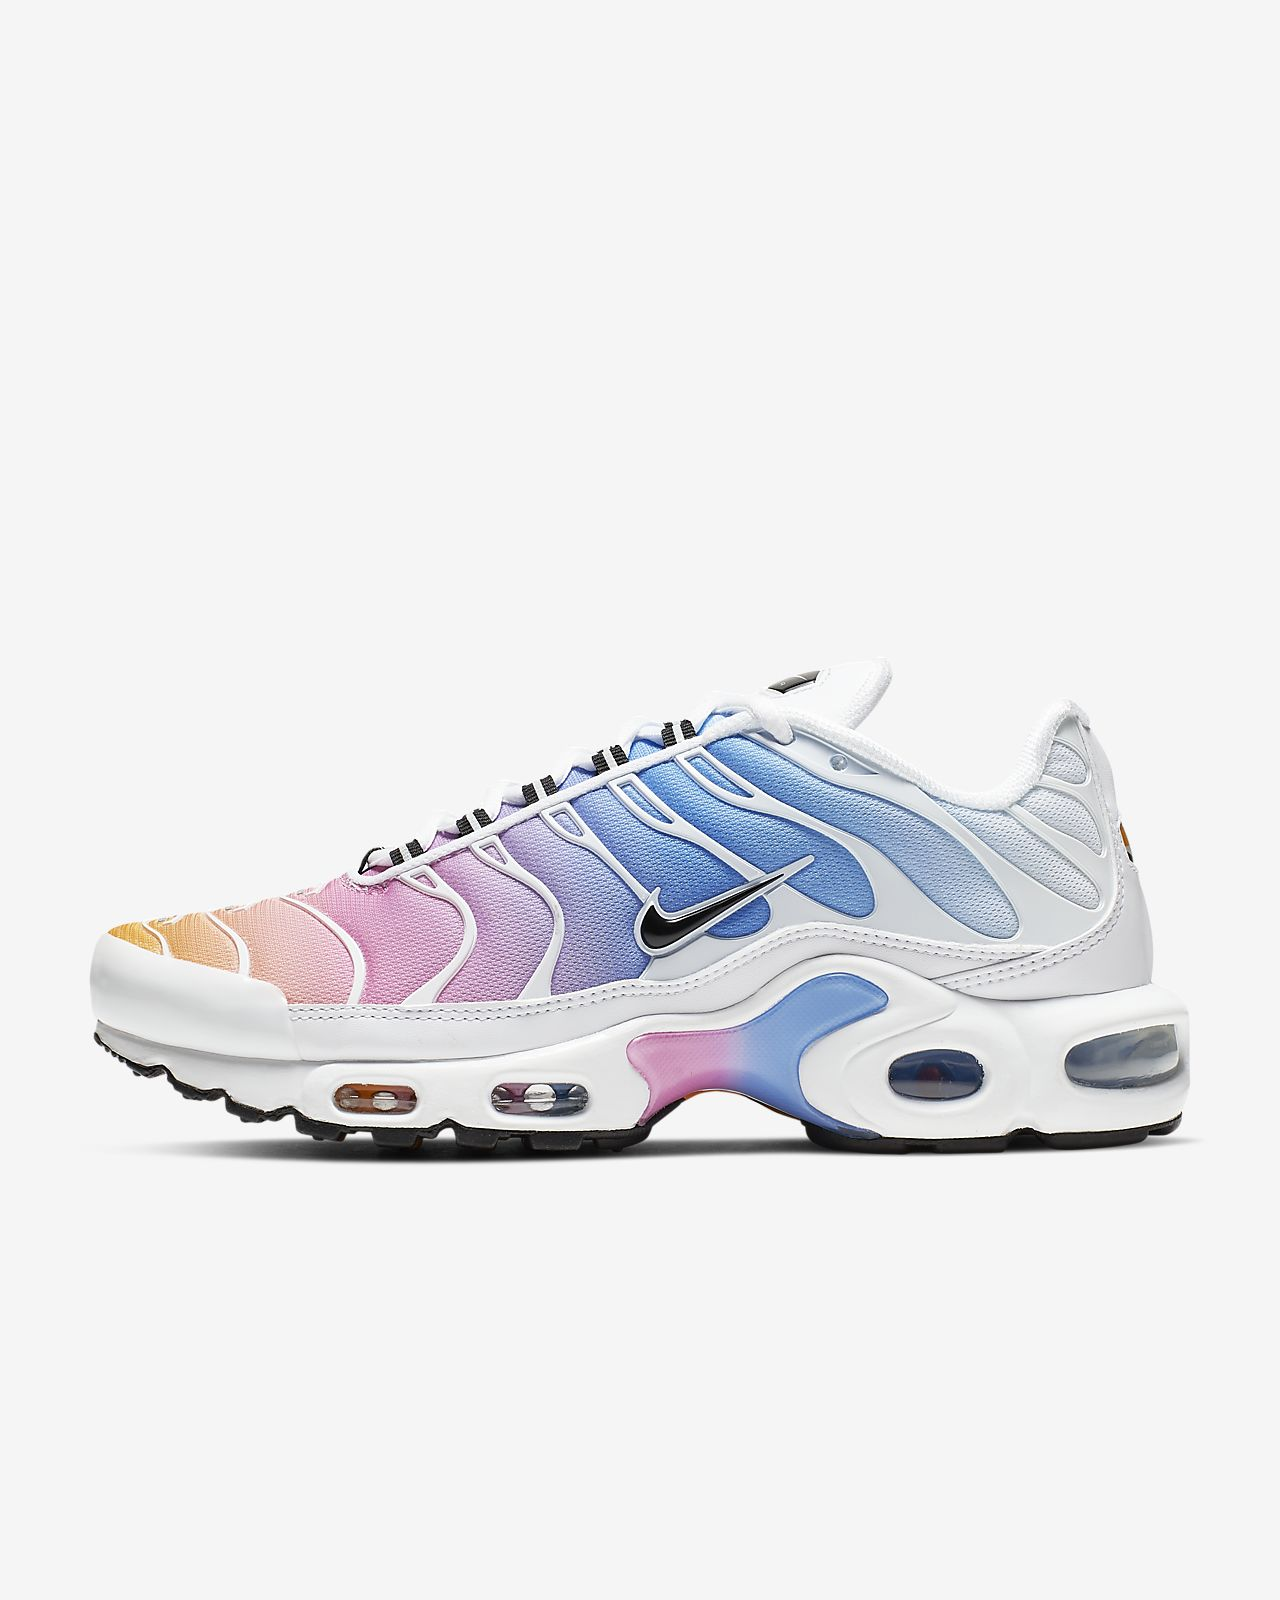 Calzado Nike Air Max Plus